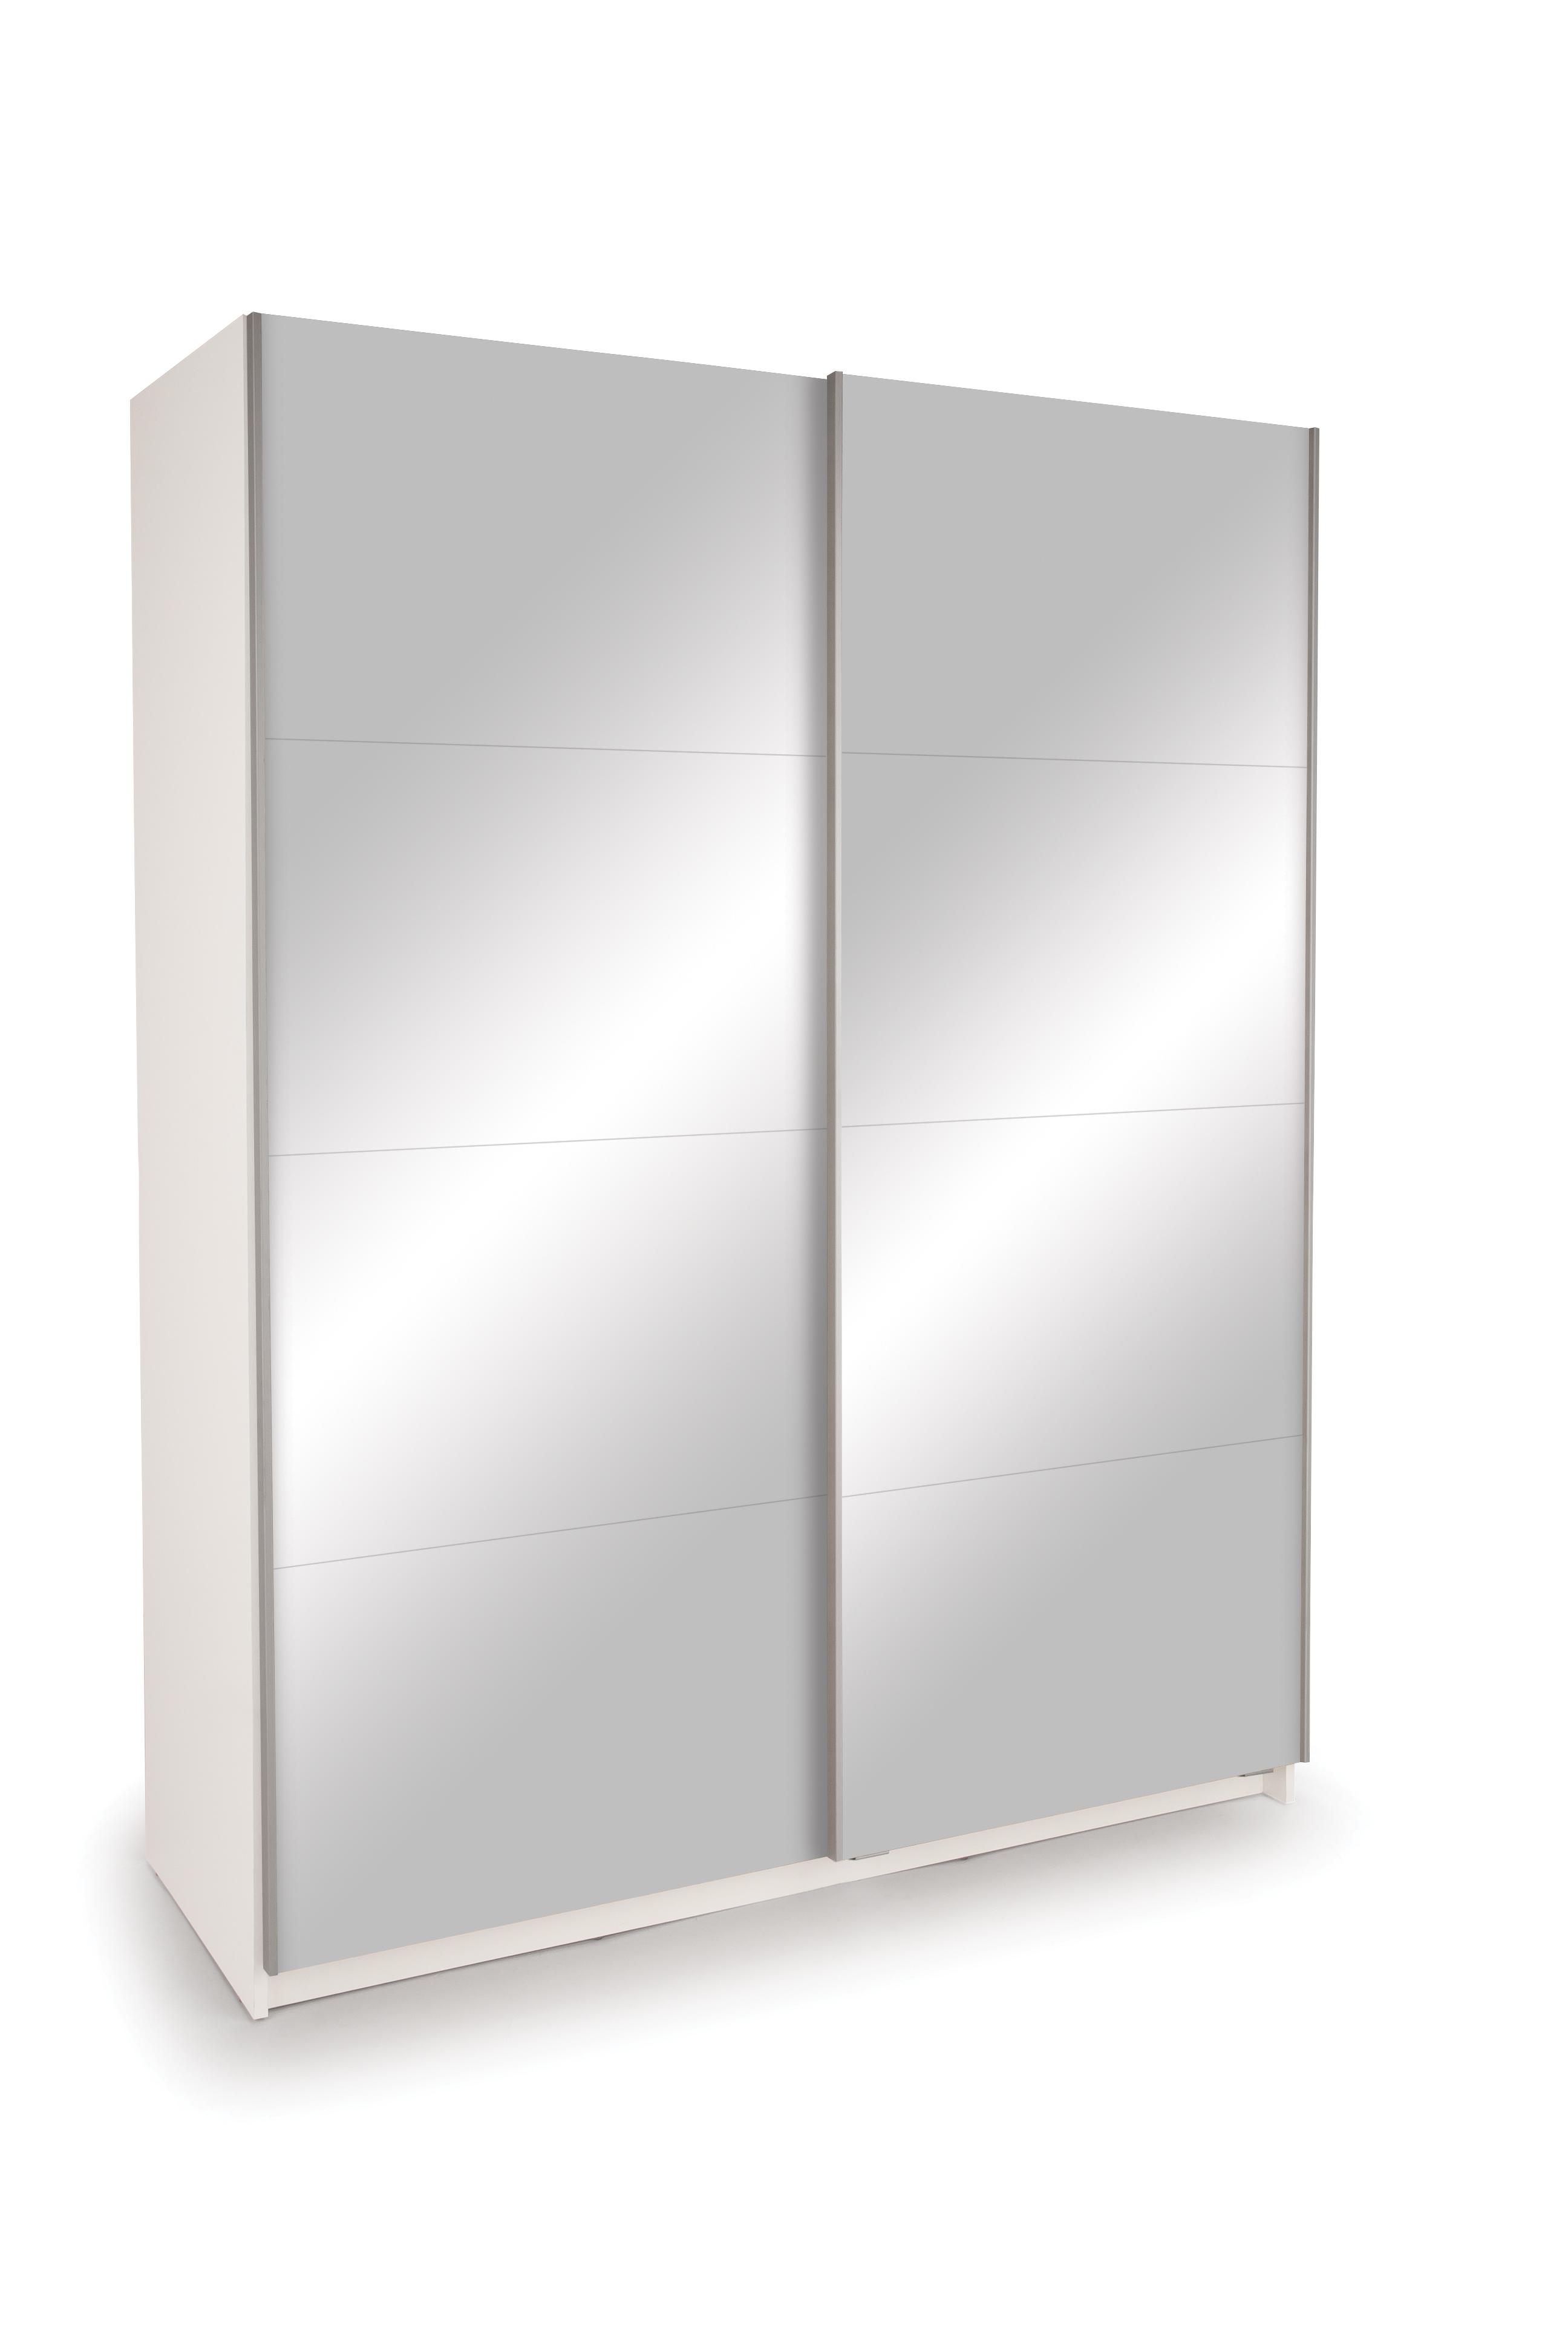 Dallas White Sliding Door Wardrobe- Double Mirror